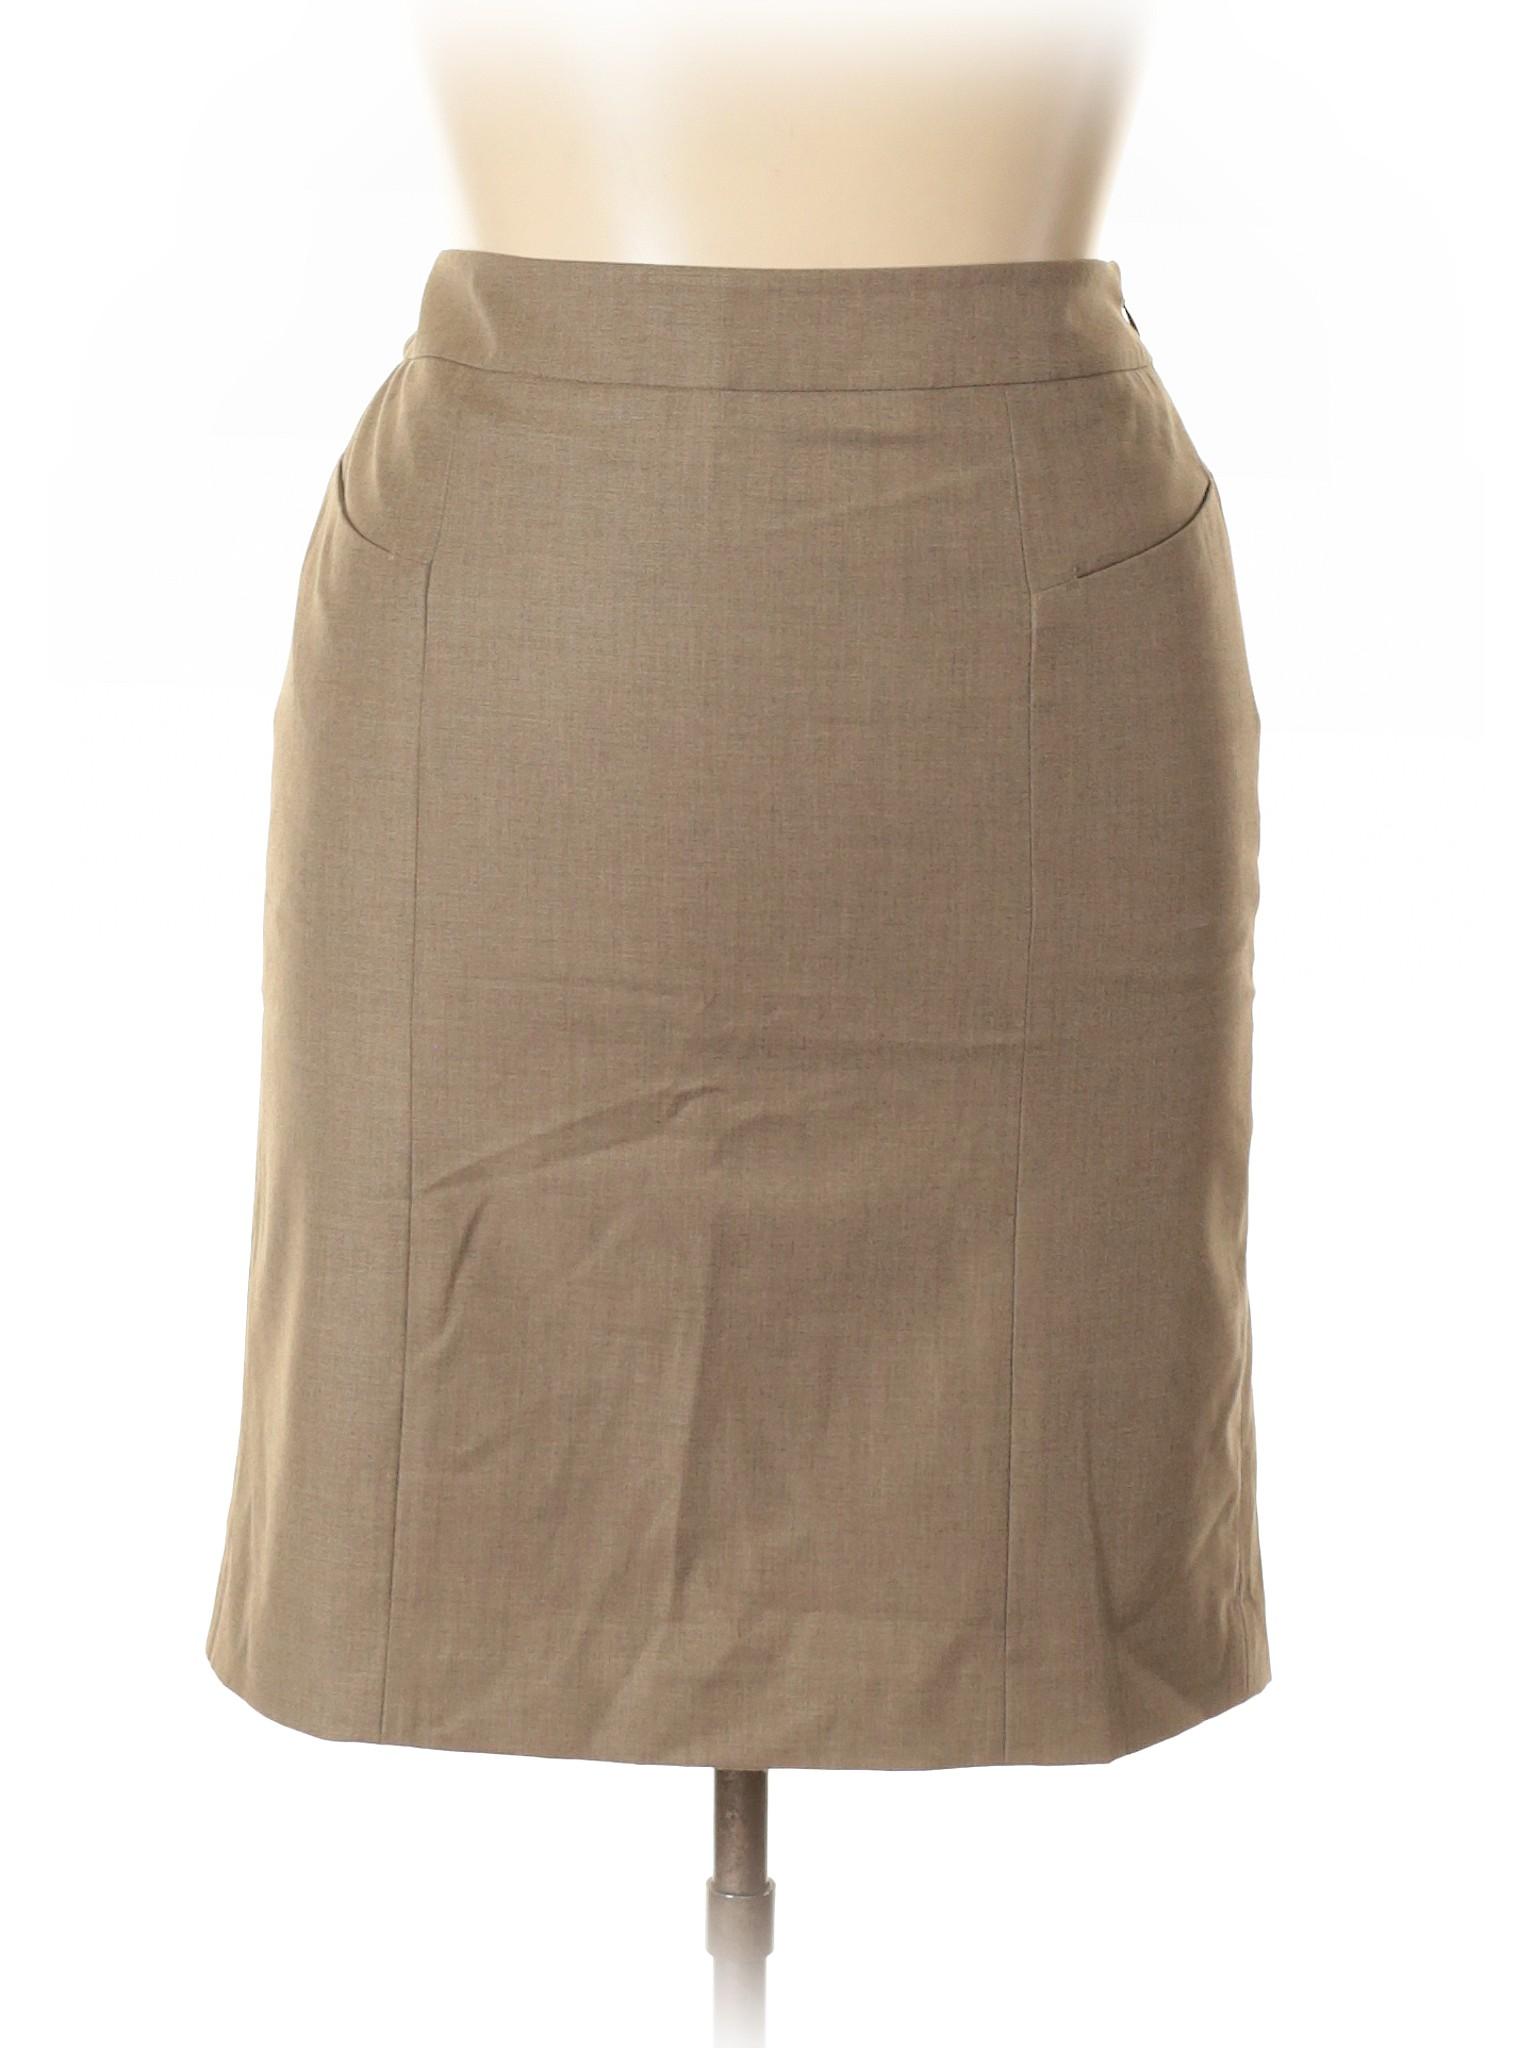 Taylor Skirt Ann Boutique LOFT Casual Hnw7Rfwx